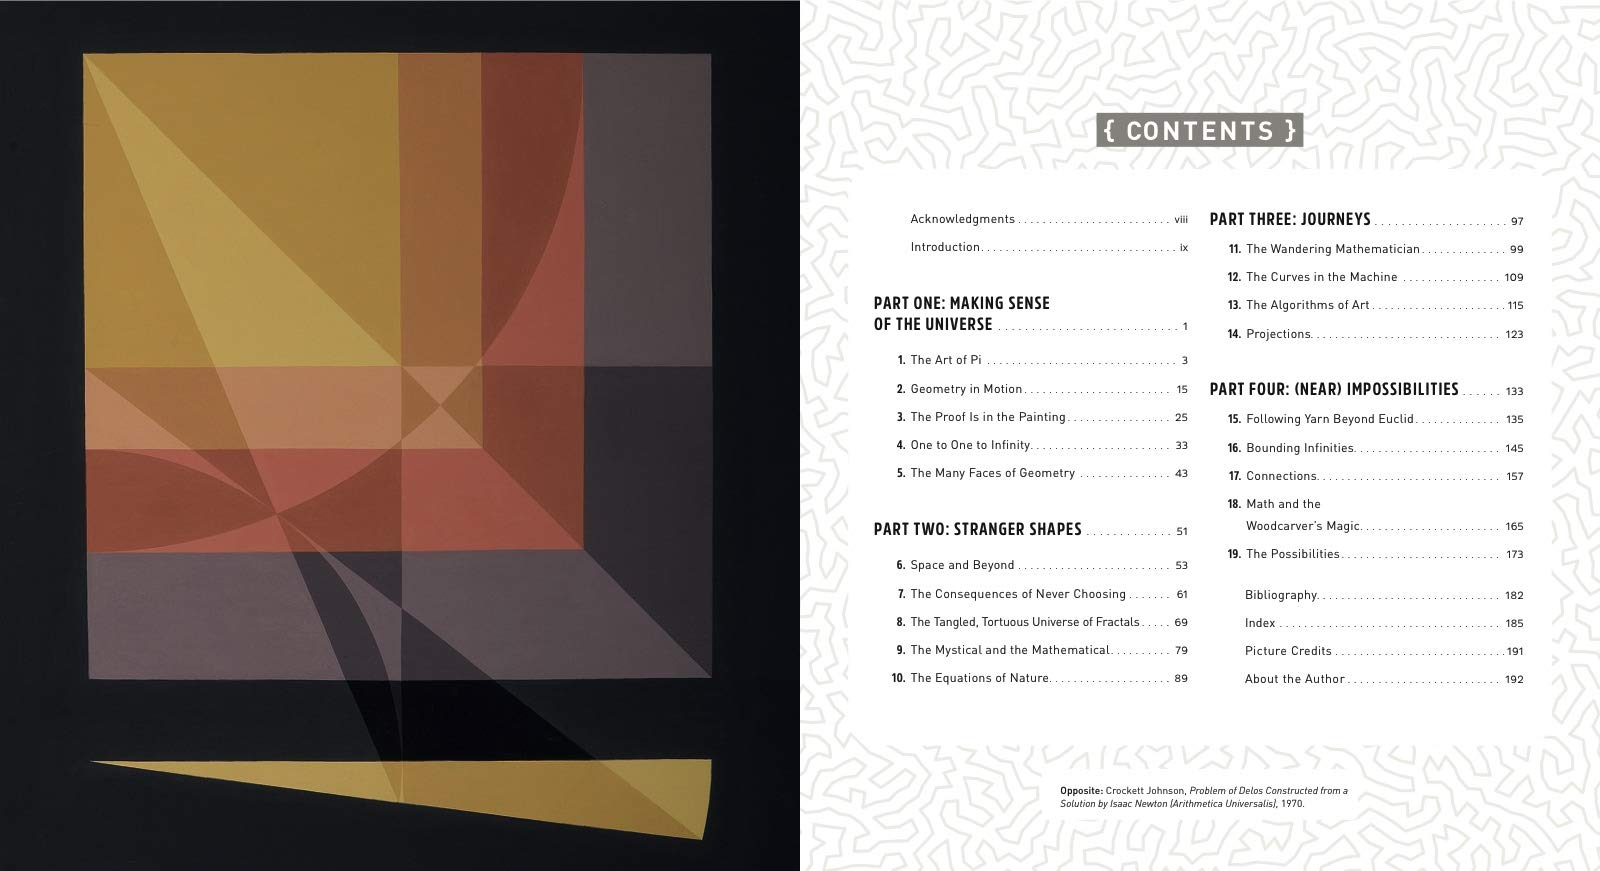 Ornes, S: Math Art: Truth, Beauty, and Equations: Amazon.es: Ornes, Stephen: Libros en idiomas extranjeros